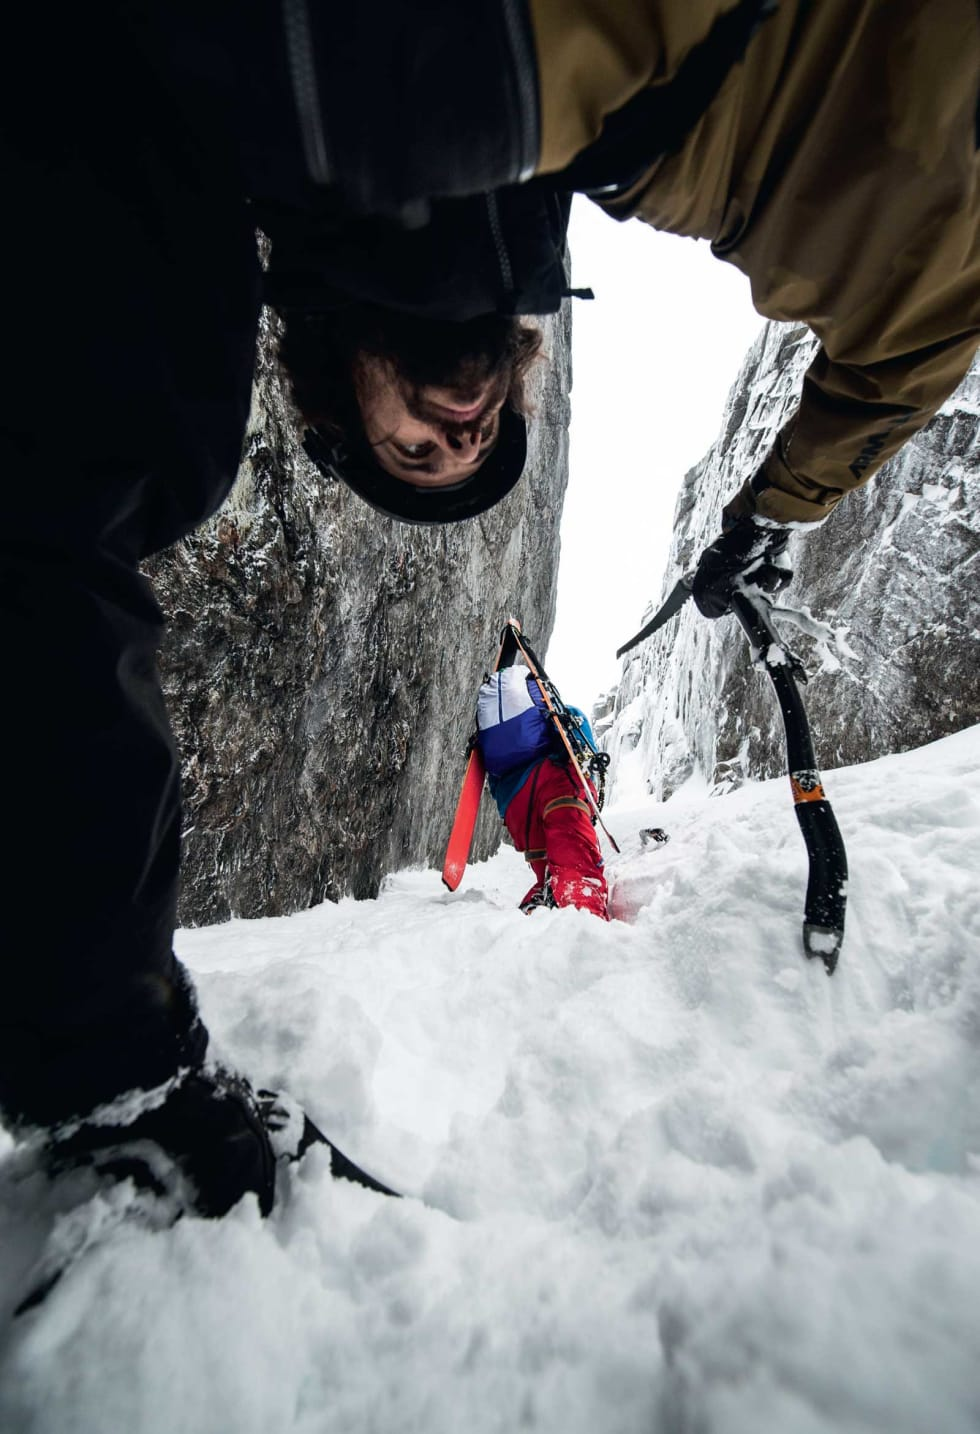 JP Auclair følger Andreas Fransson opp Kulhornsrenna. Foto: Daniel Rönnbäck / Toppturer rundt Narvik.